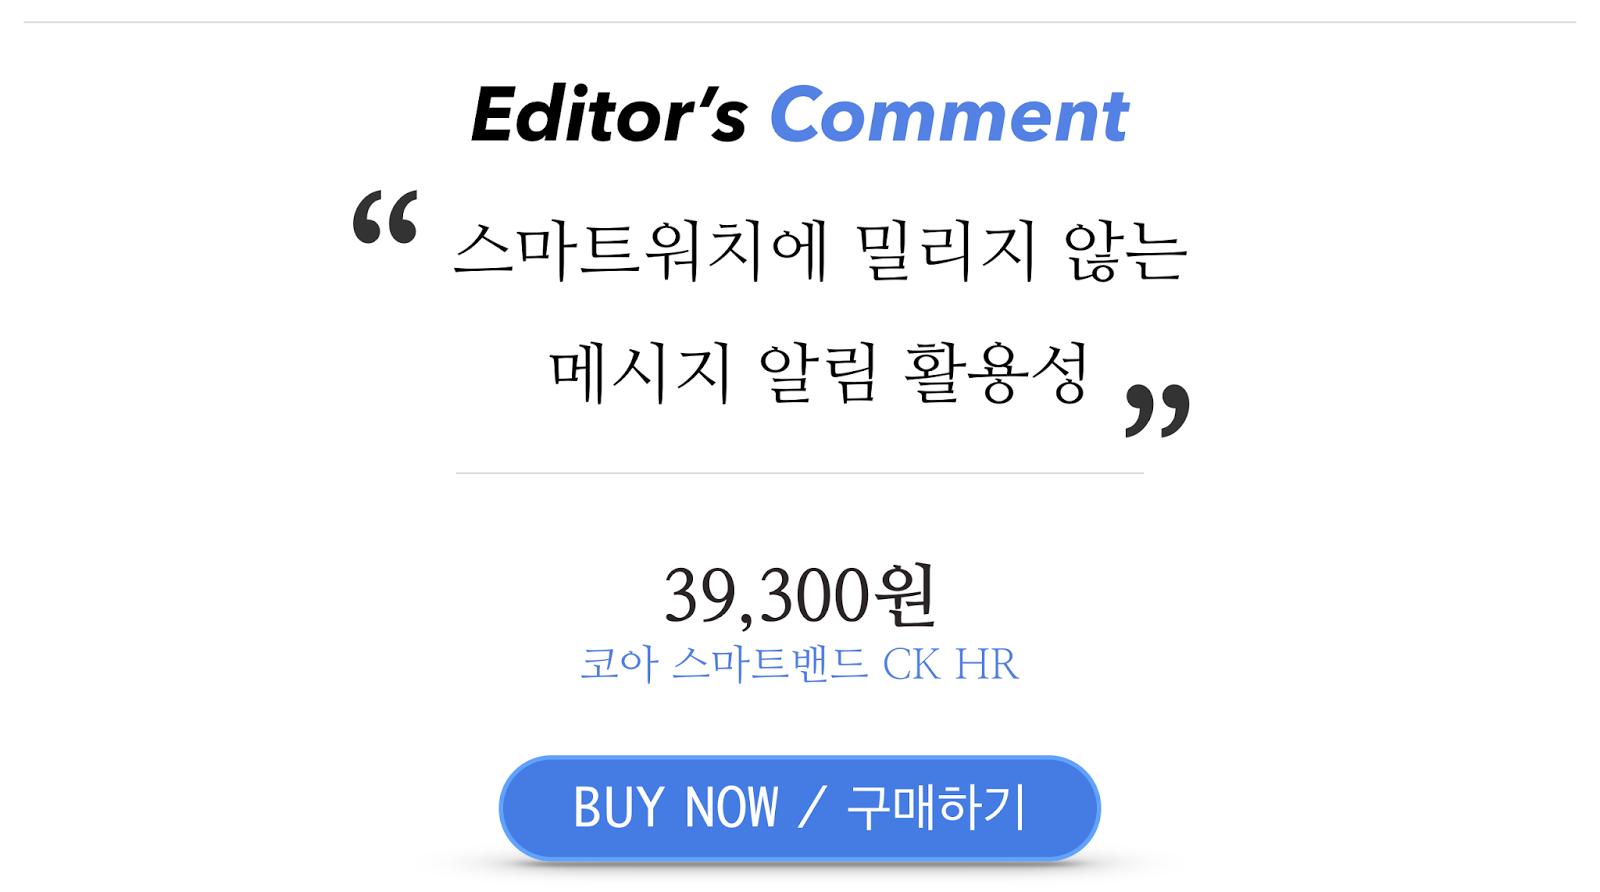 http://storefarm.naver.com/enjoycoa/products/2190015545